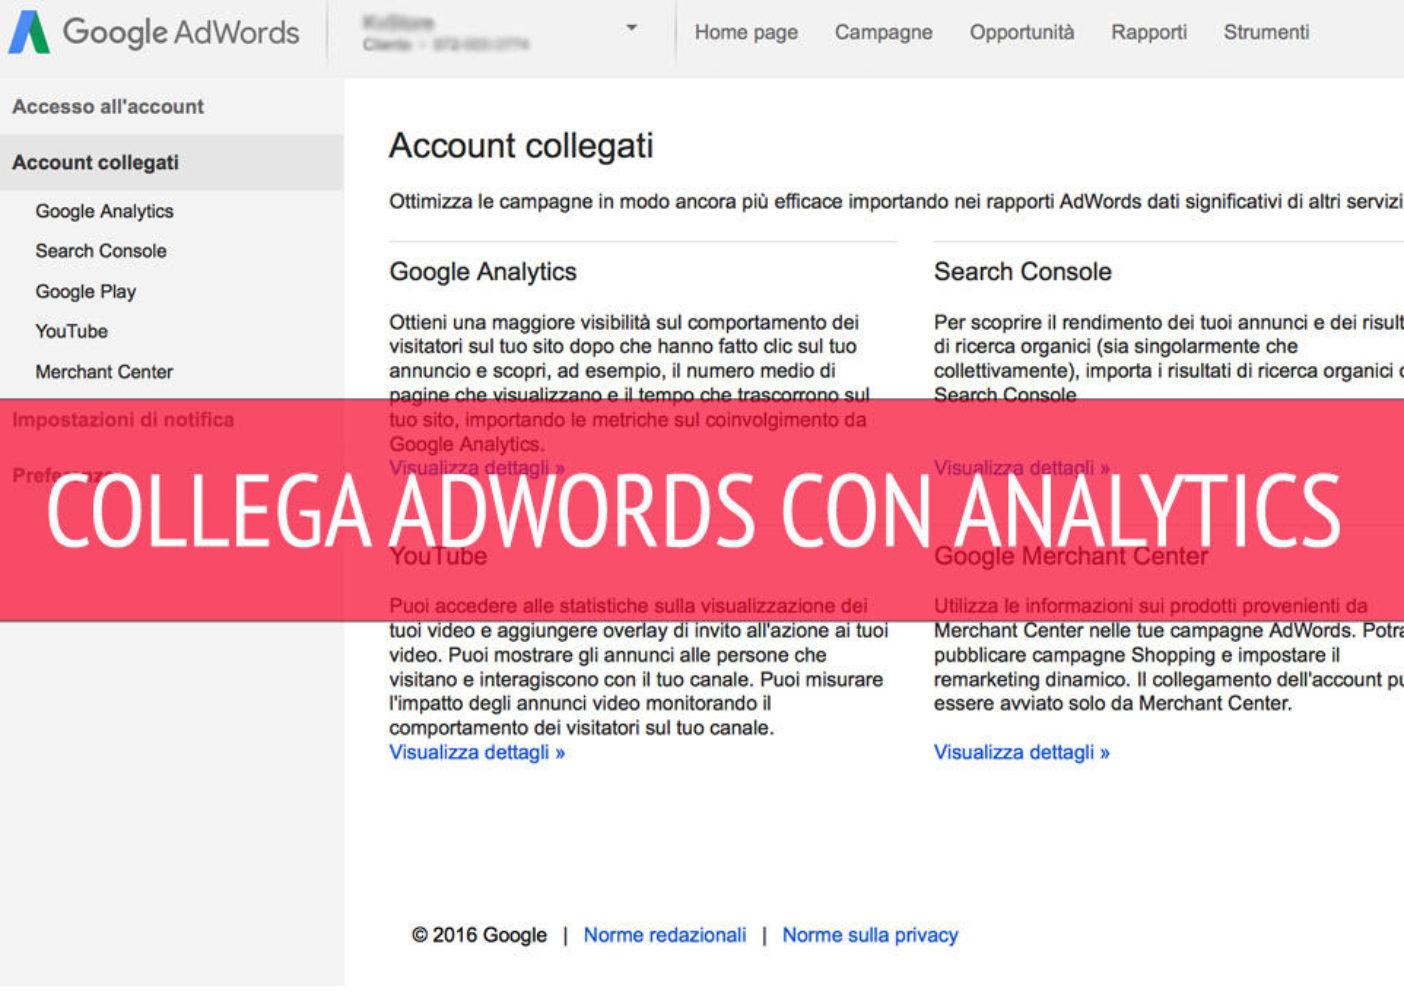 Collegare Google Analytics a Google AdWords, Come Collegare Google Analytics a Google AdWords